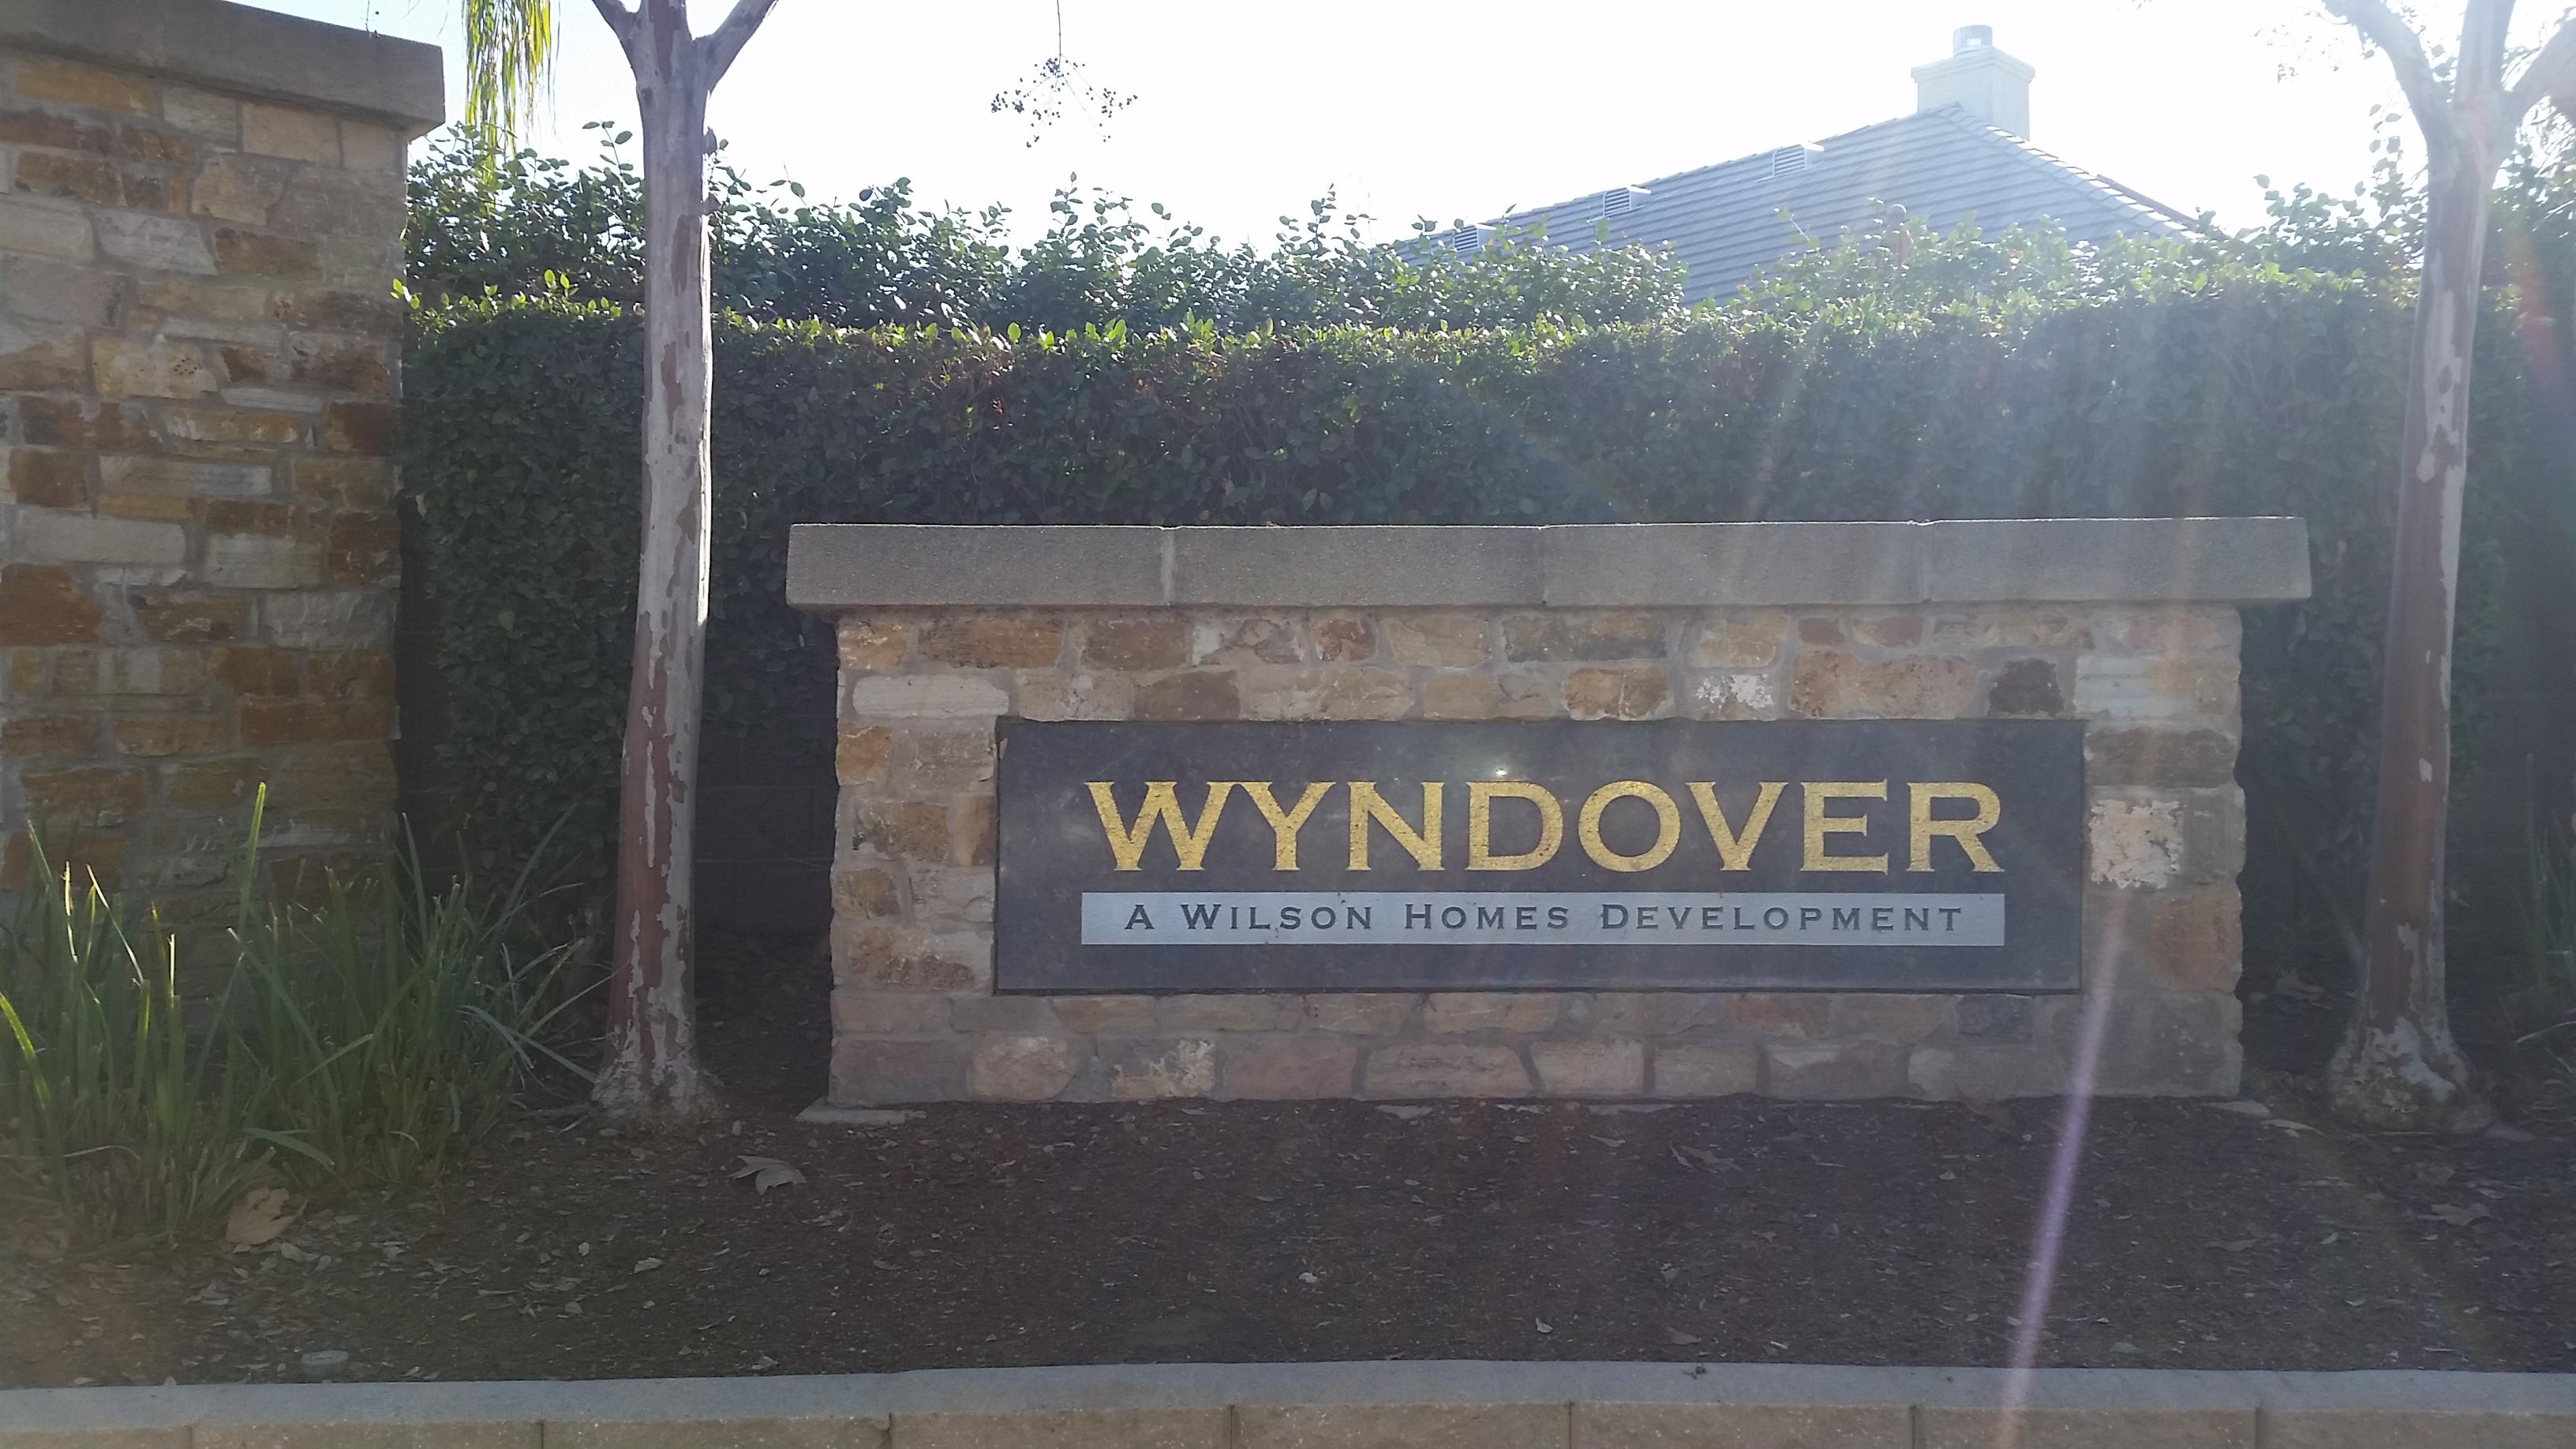 Wyndover